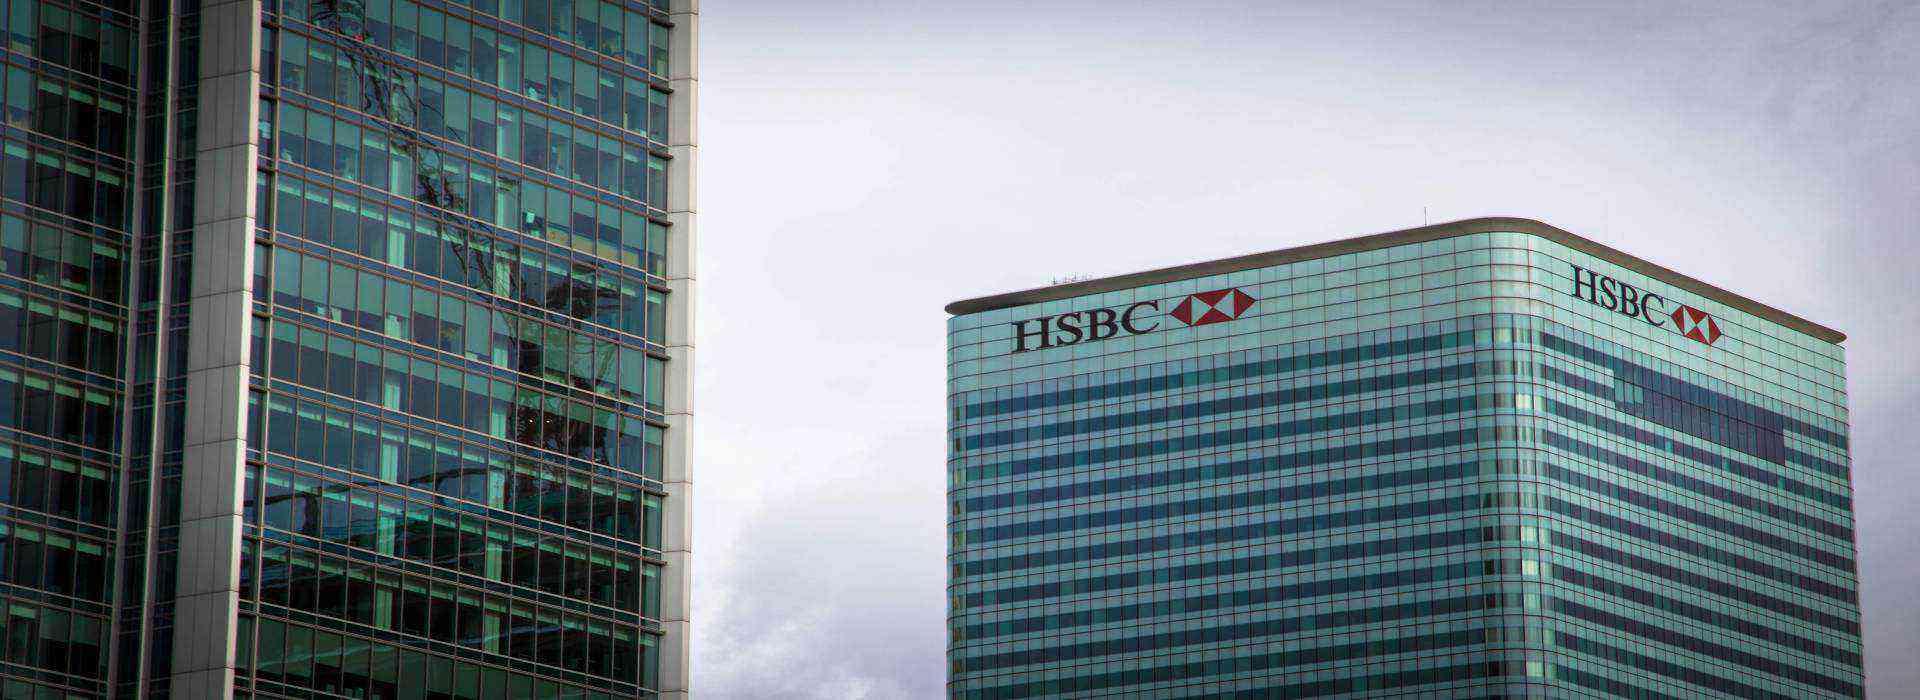 HSBC Bank Malaysia Customer Service Number, Address, Email